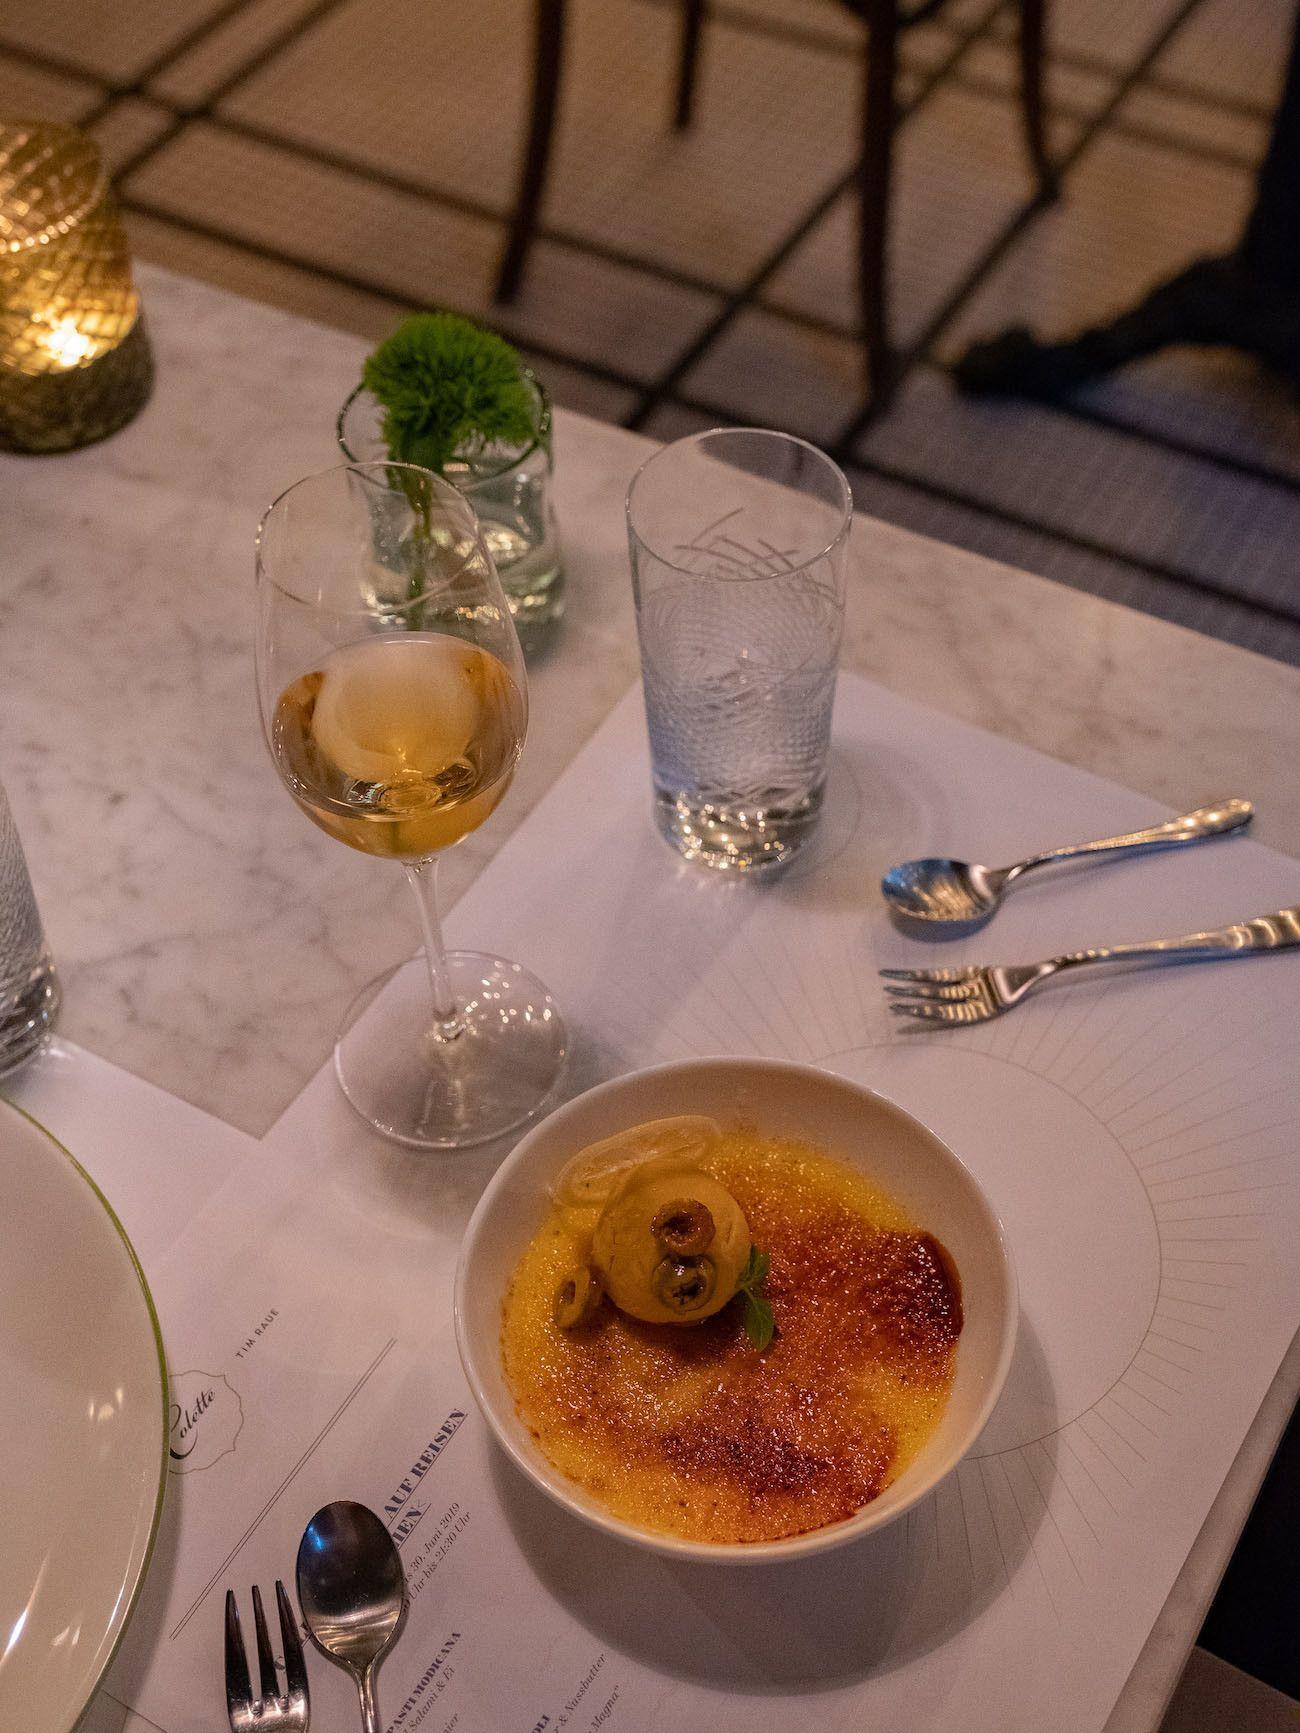 Foodblog, About Fuel, Brasserie Colette Tim Raue, Crème Brûlée